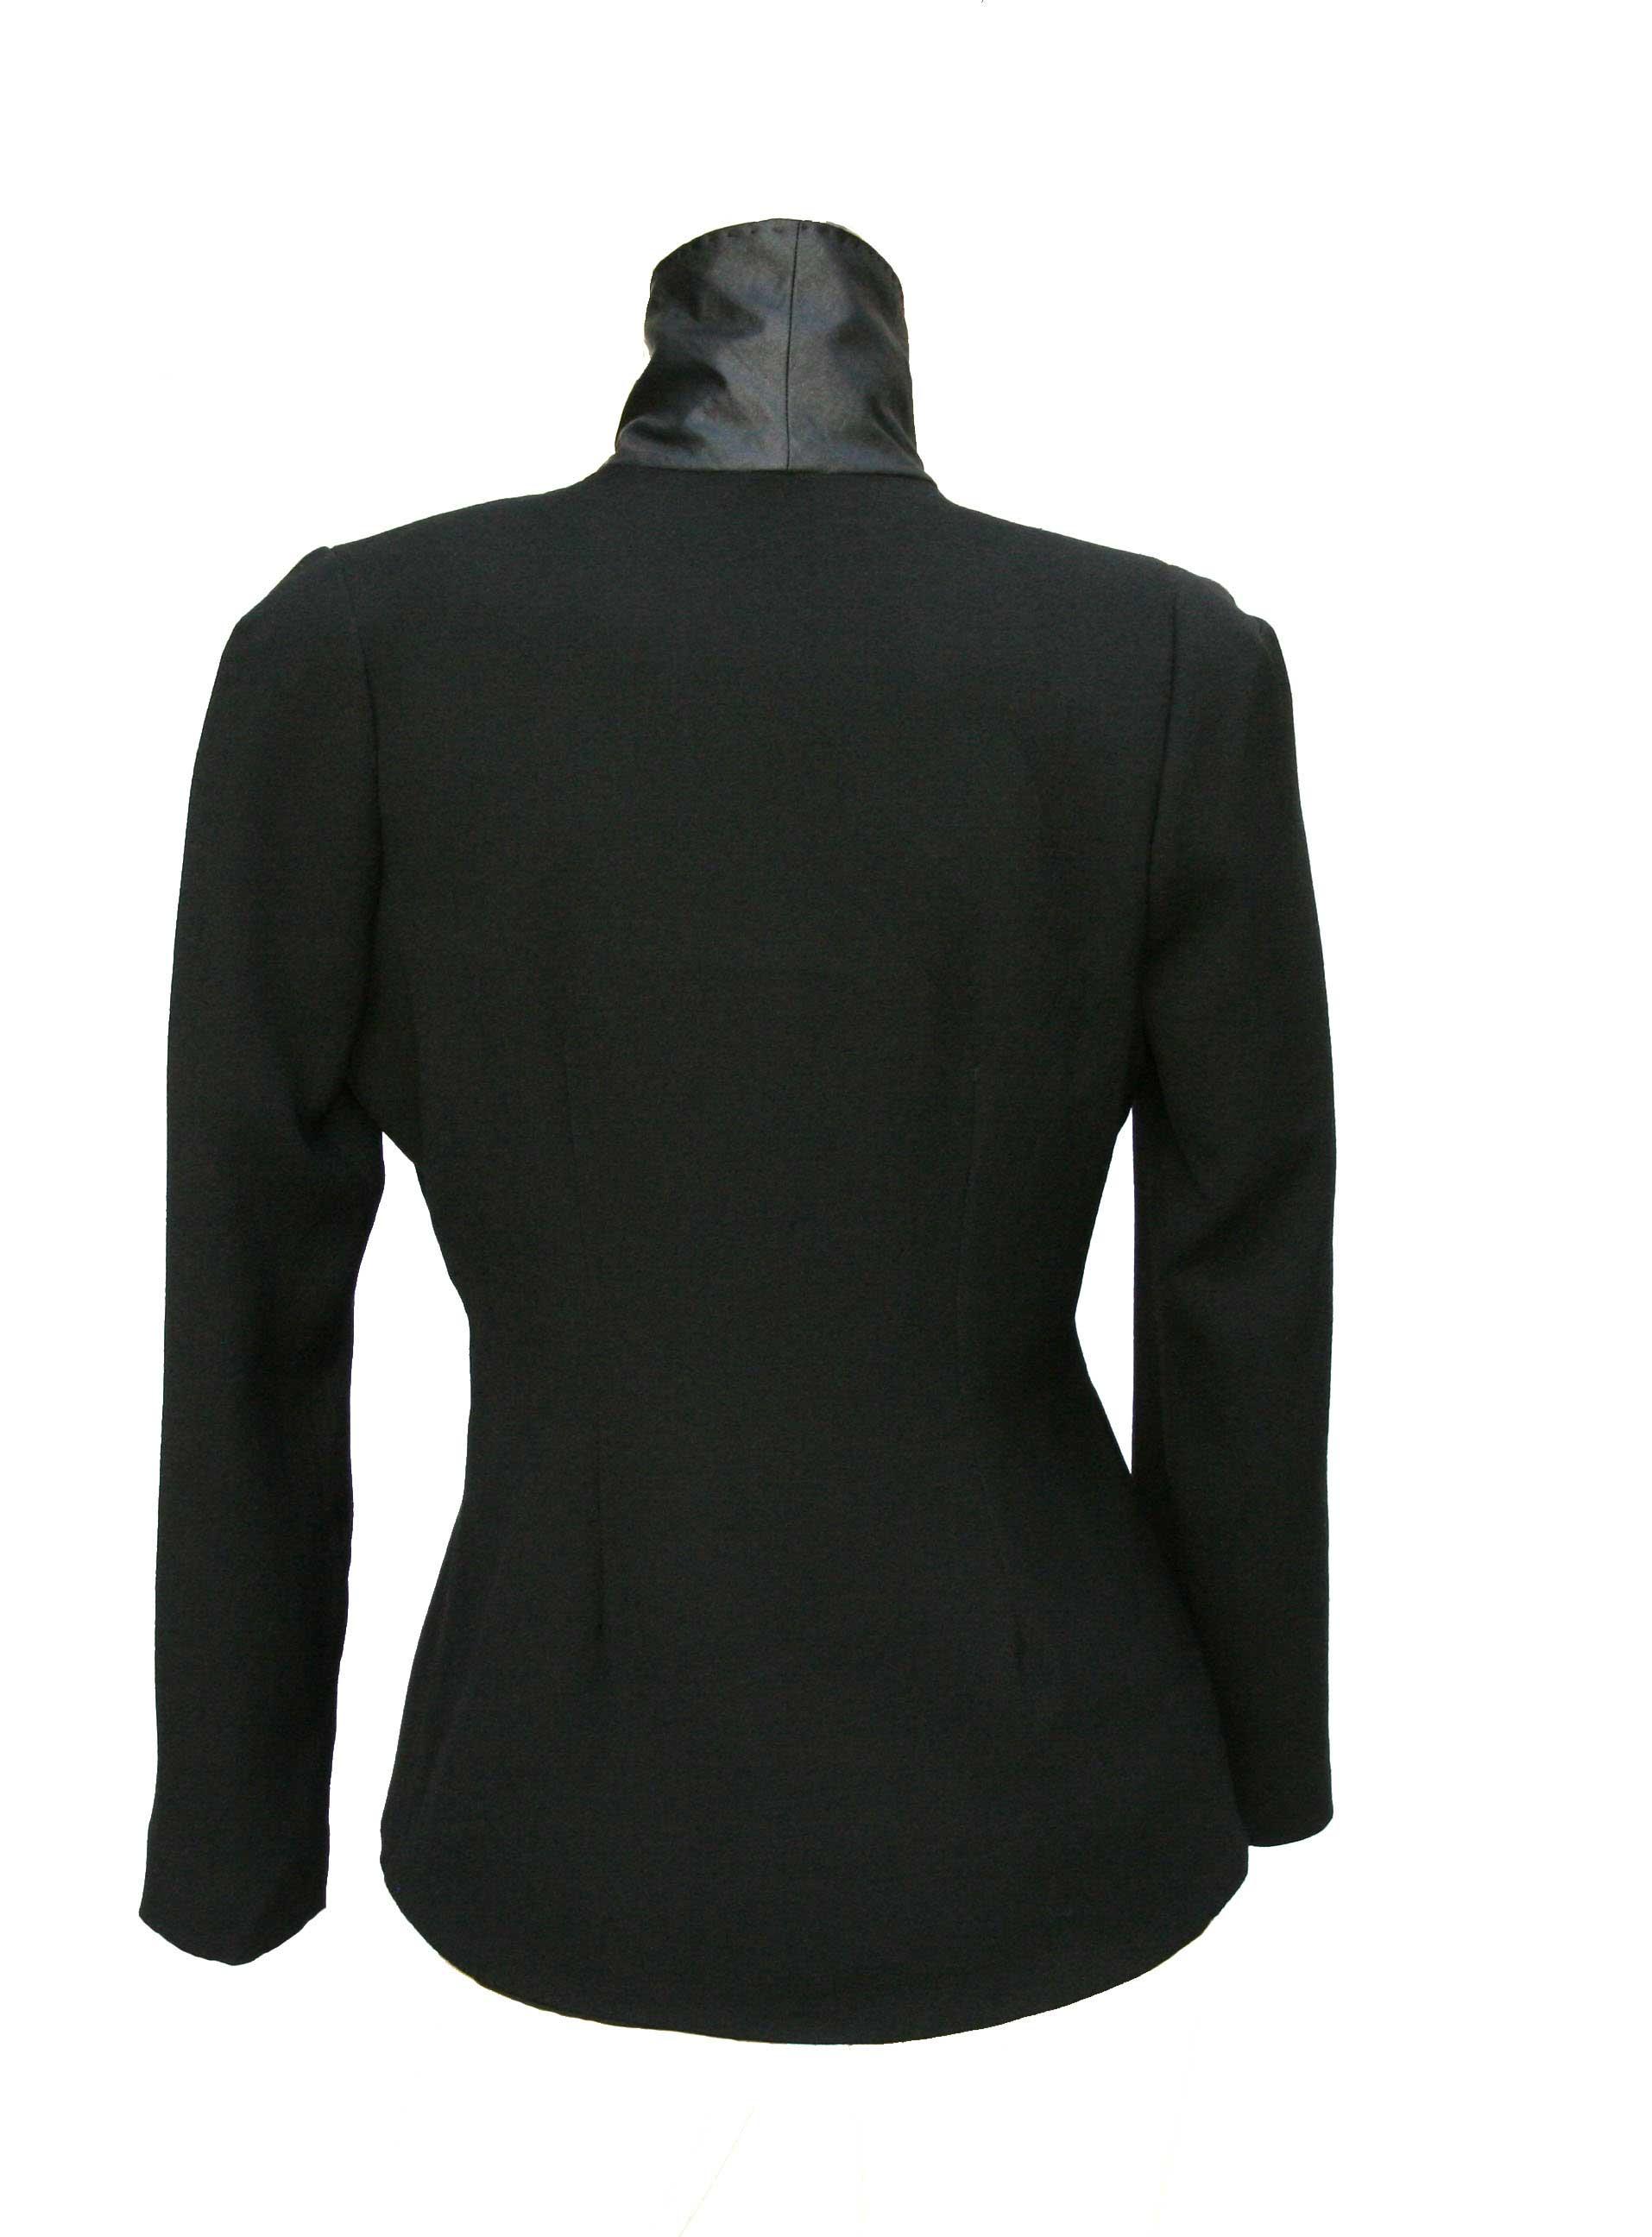 veste smoking dos coupe ajustée